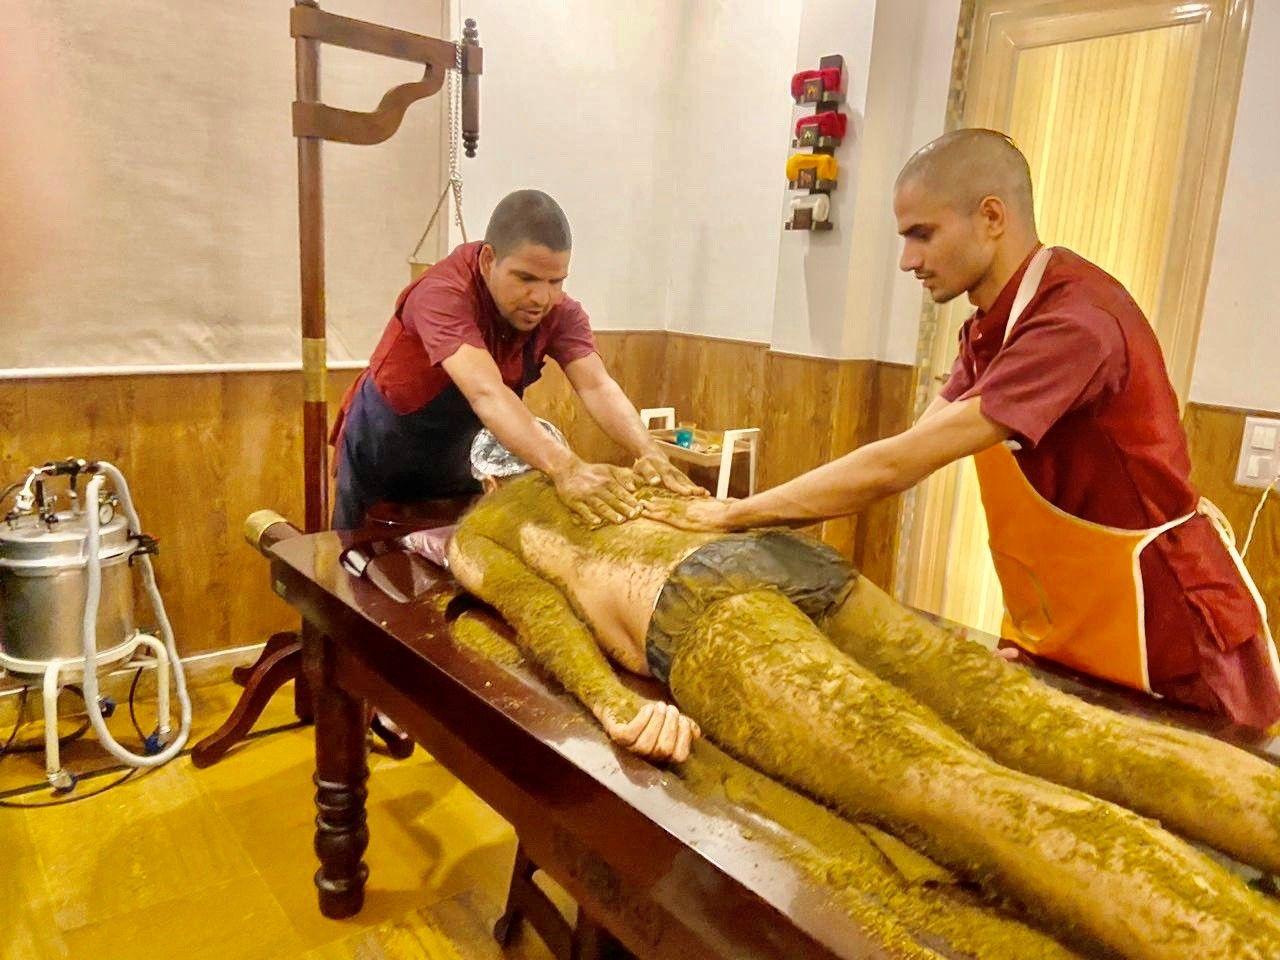 Udhvarthana Ayurvedic treatment at The Best Ayurveda Panchakarma Yoga Retreat in Rishikesh India - Veda5